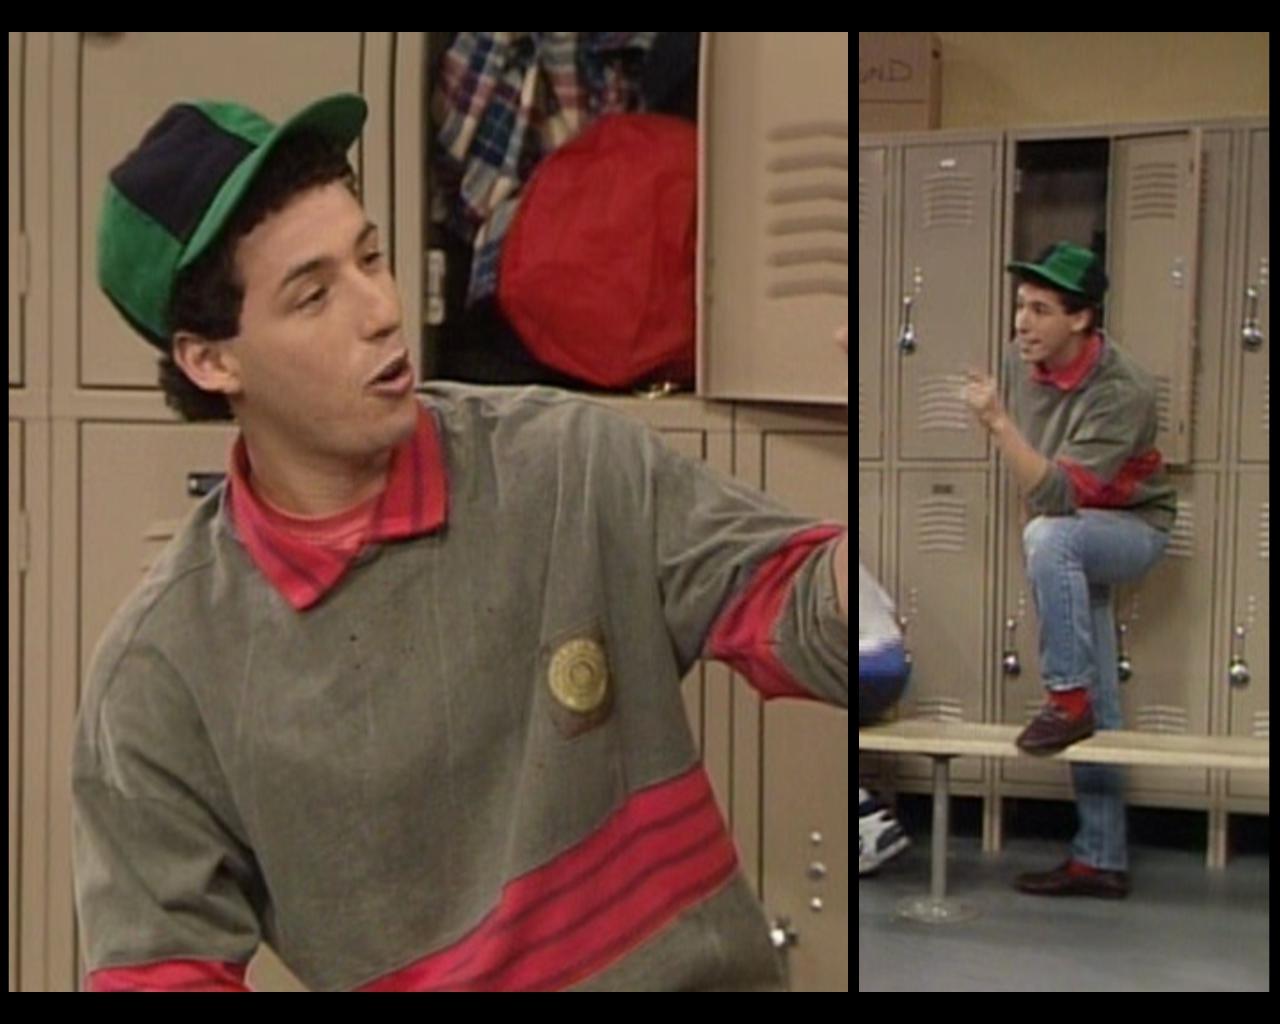 Adam Sandler Cosby Show huxtable hotness: season 4, episode 11: the locker room